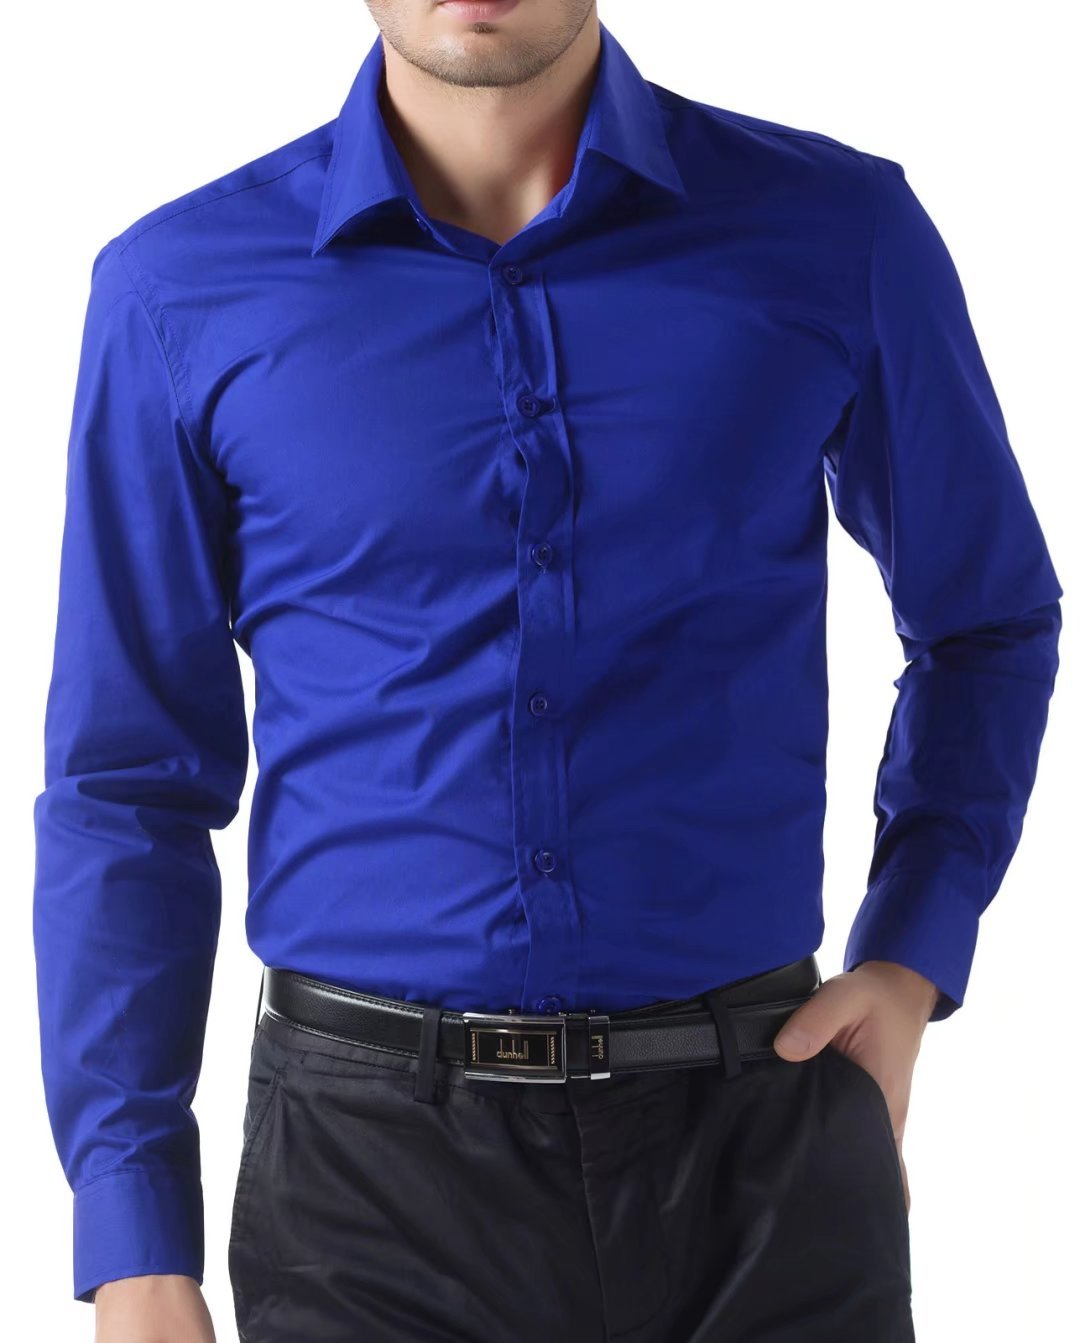 Paul Jones Mens Shirts Stylish Slim Fit Shirts Collared Polo Top (L, Royal Blue52) by Paul Jones Mens Shirts